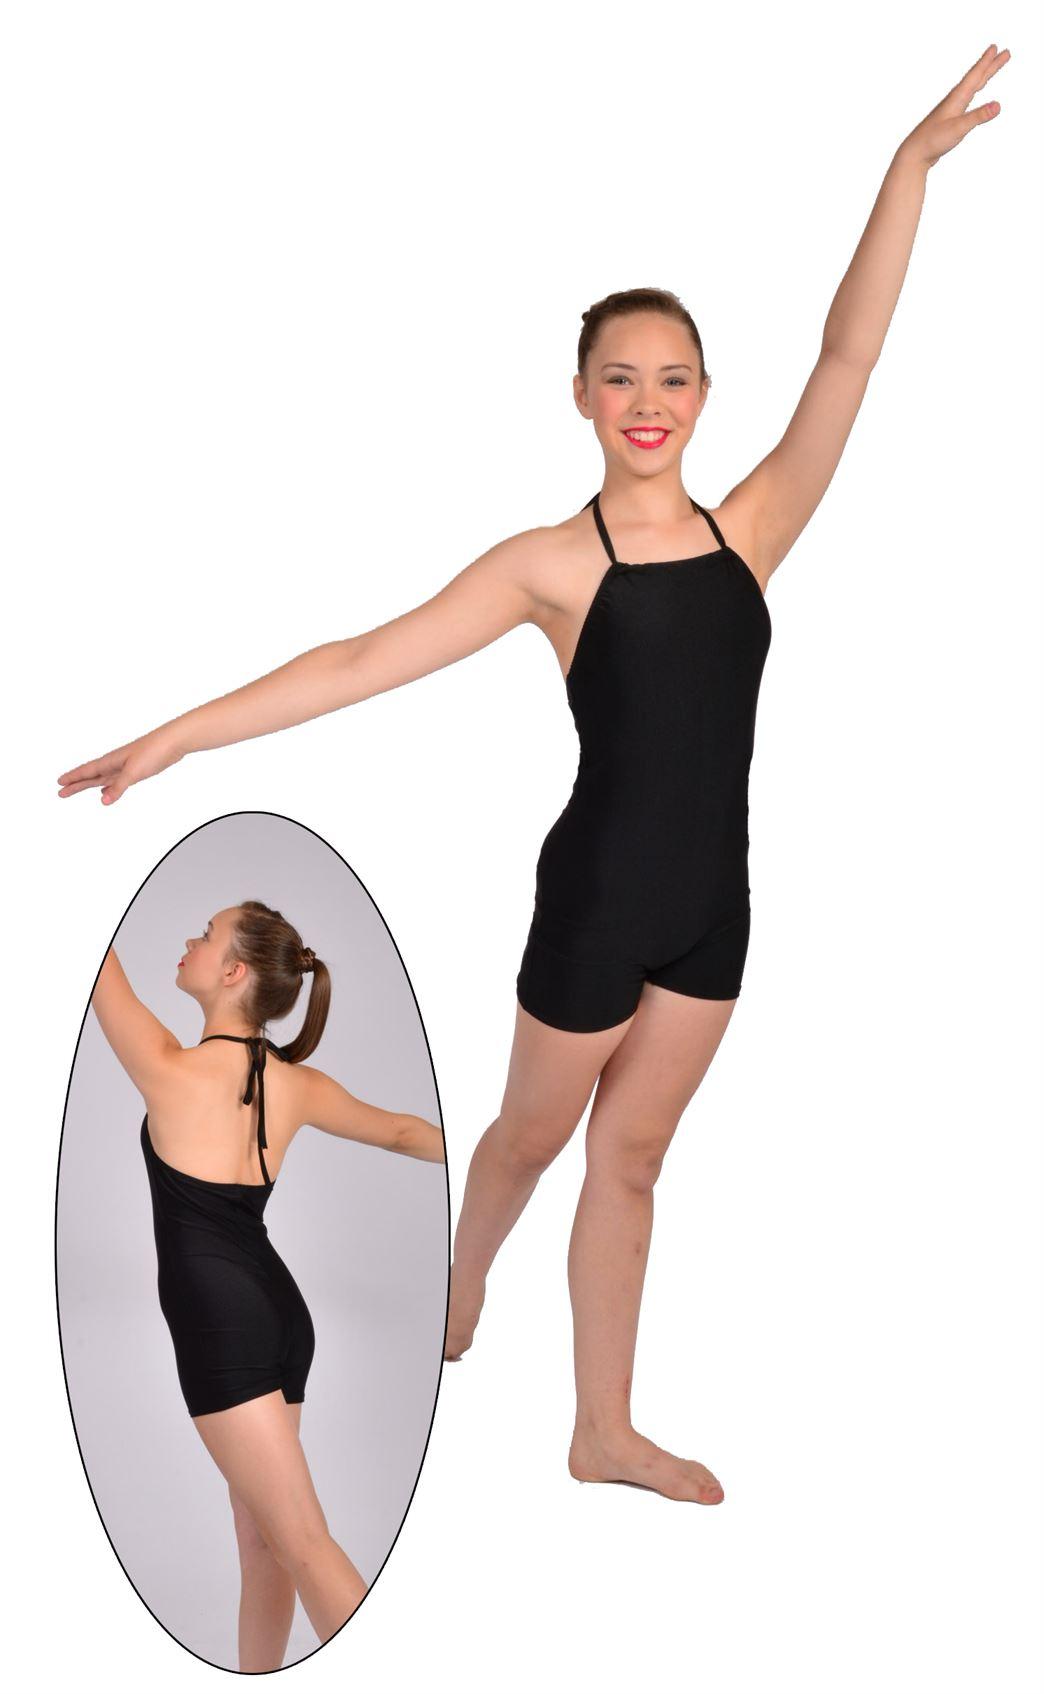 Biketard 485 Pumpers Dancewear